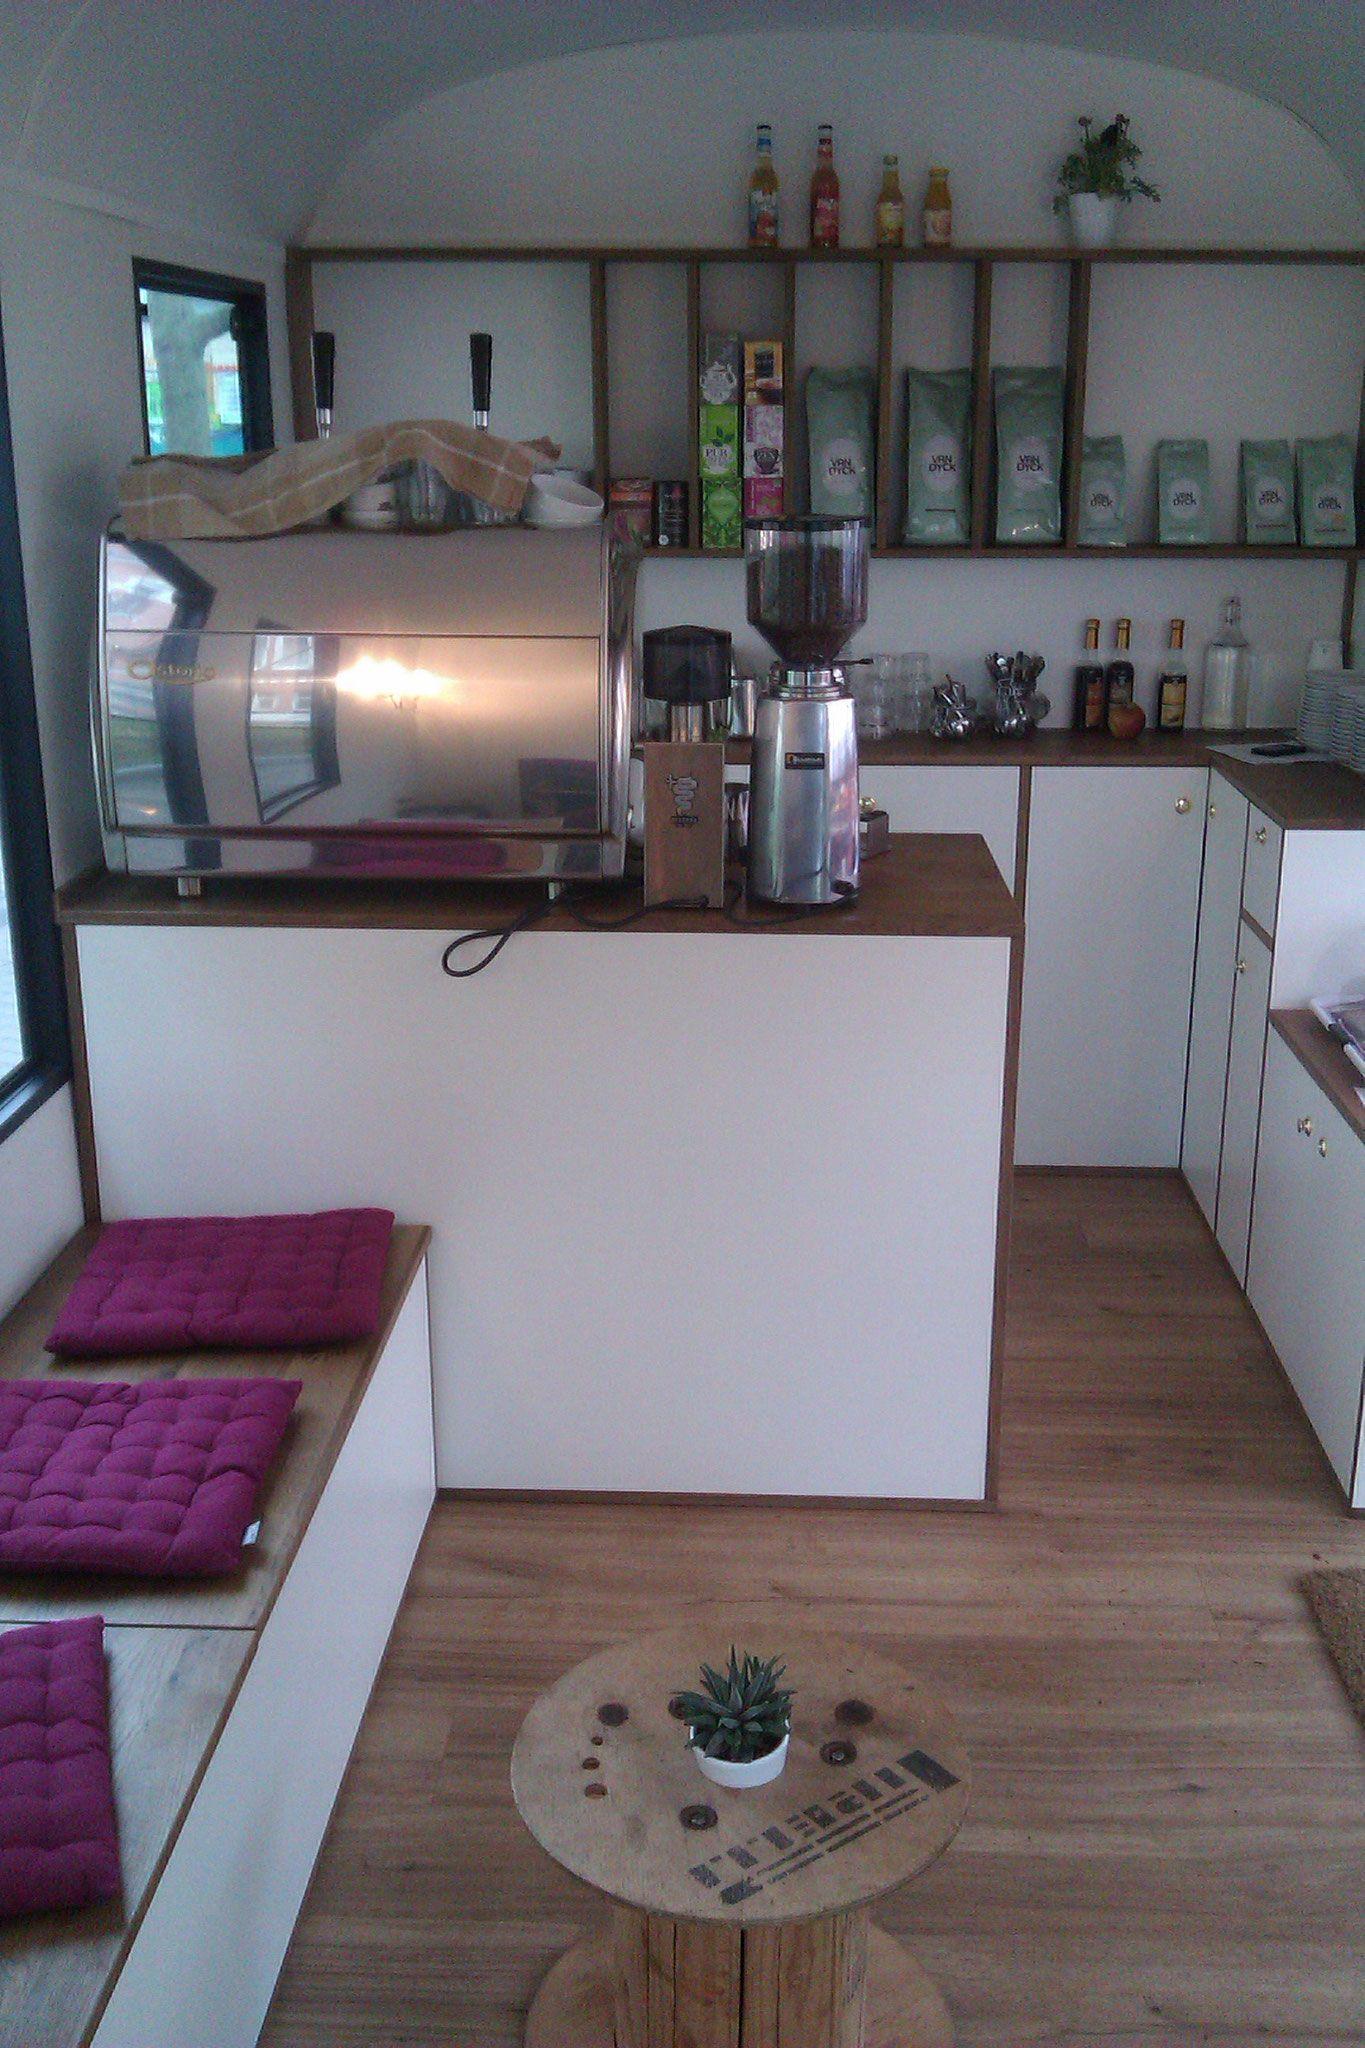 Bauwagen Cafe Kaffee Catering Cafe Mobil Cafe Loco Hannover Cafe Espresso Bar Catering